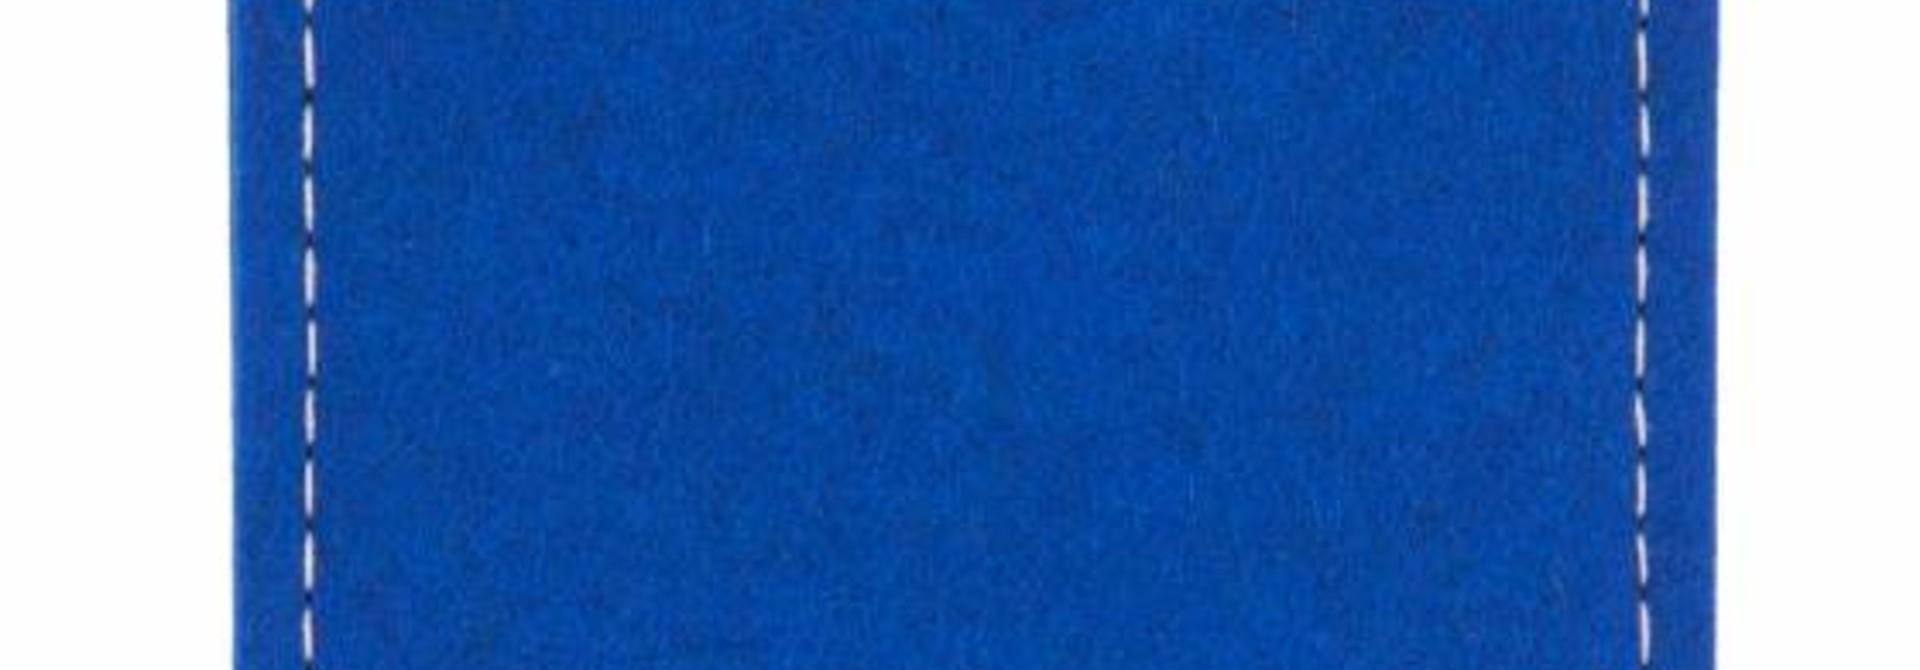 Mi / Redmi Sleeve Azure